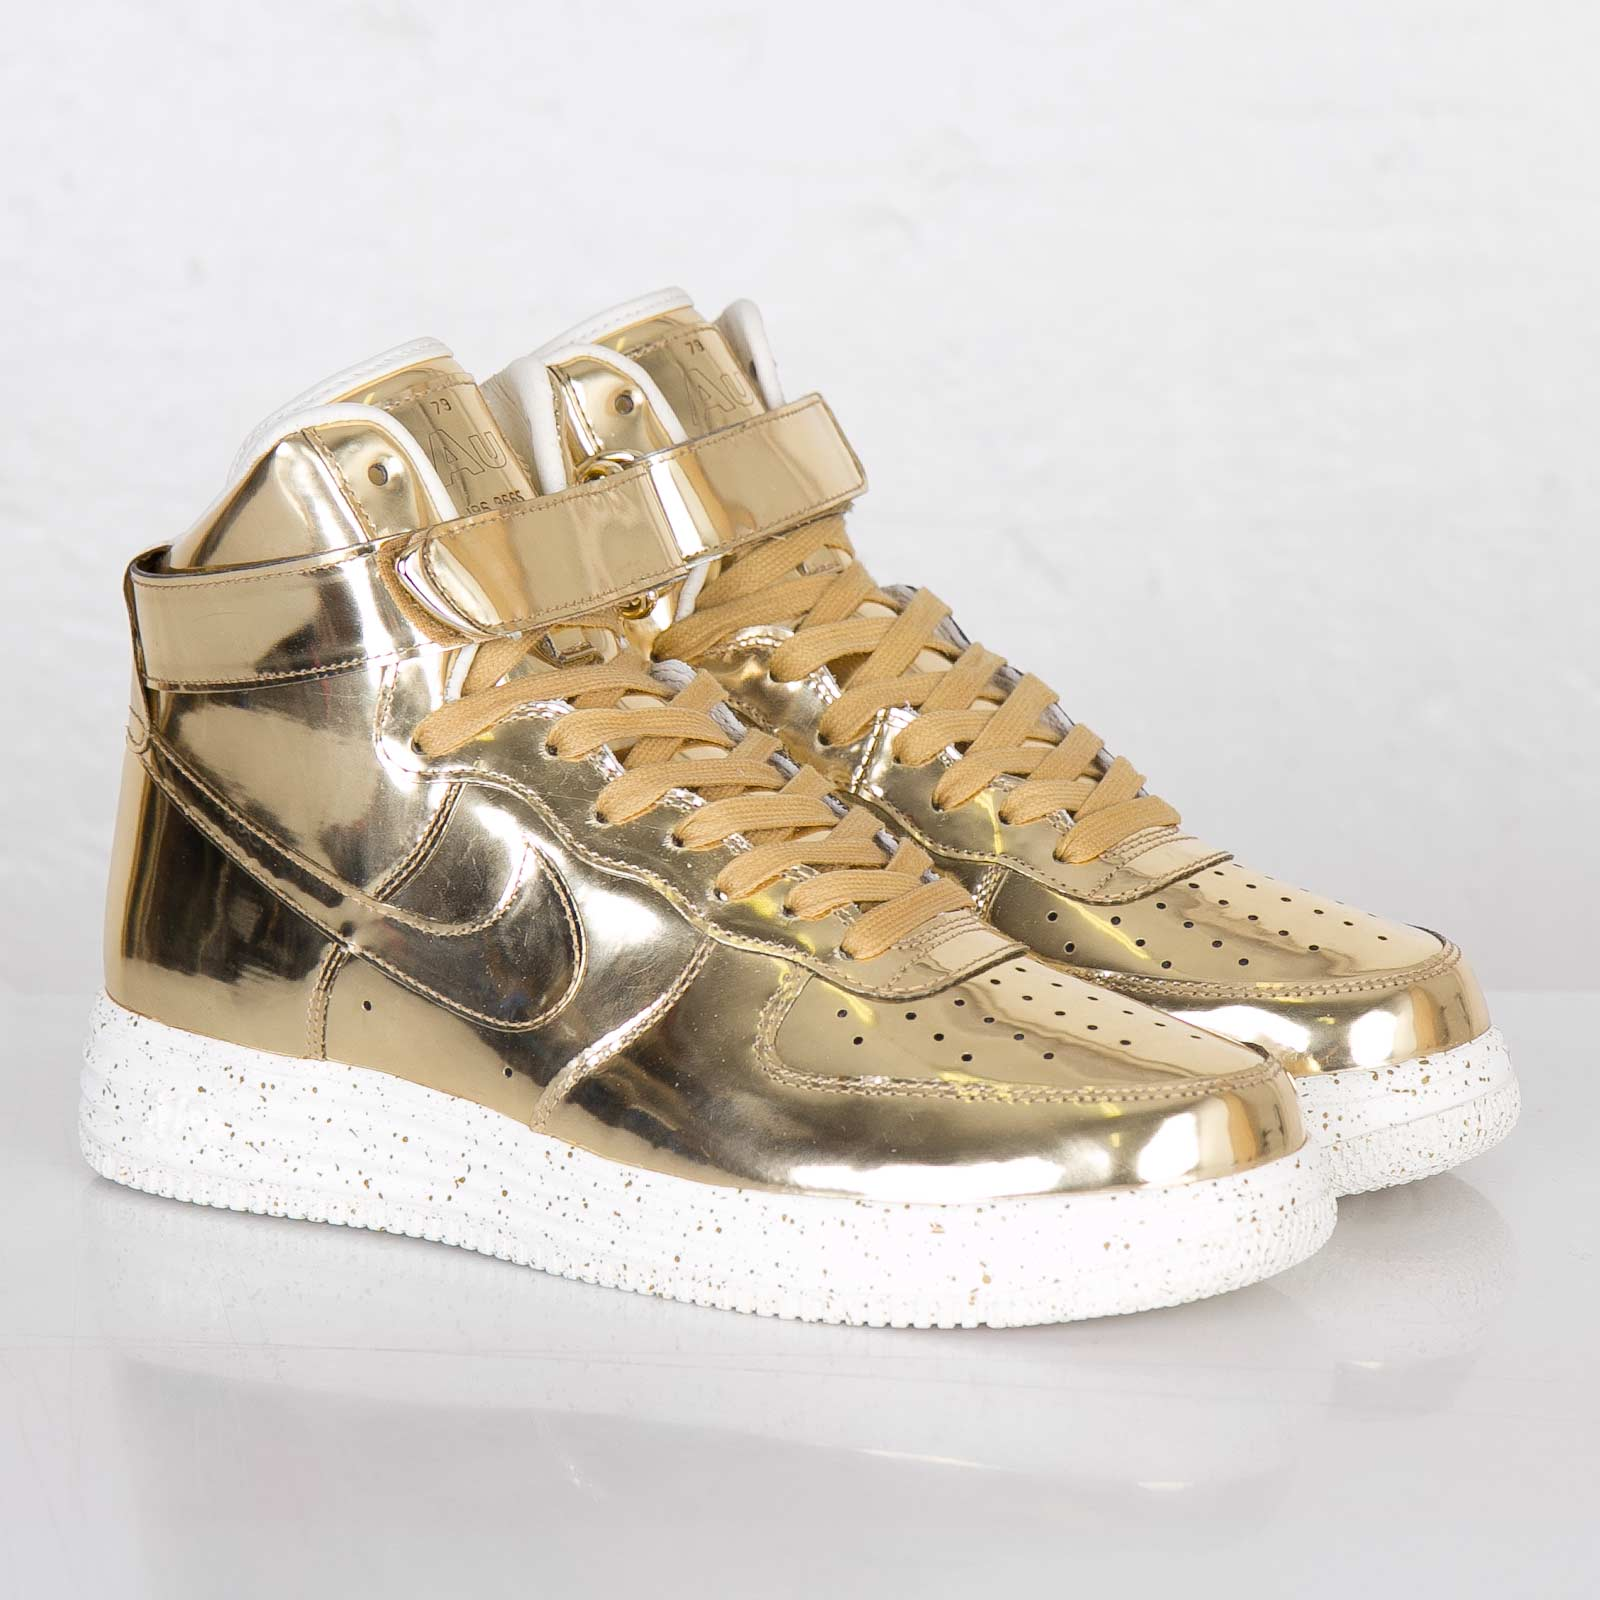 Lunar Force 1 Hi Sp liquid Gold Nike 652845 770